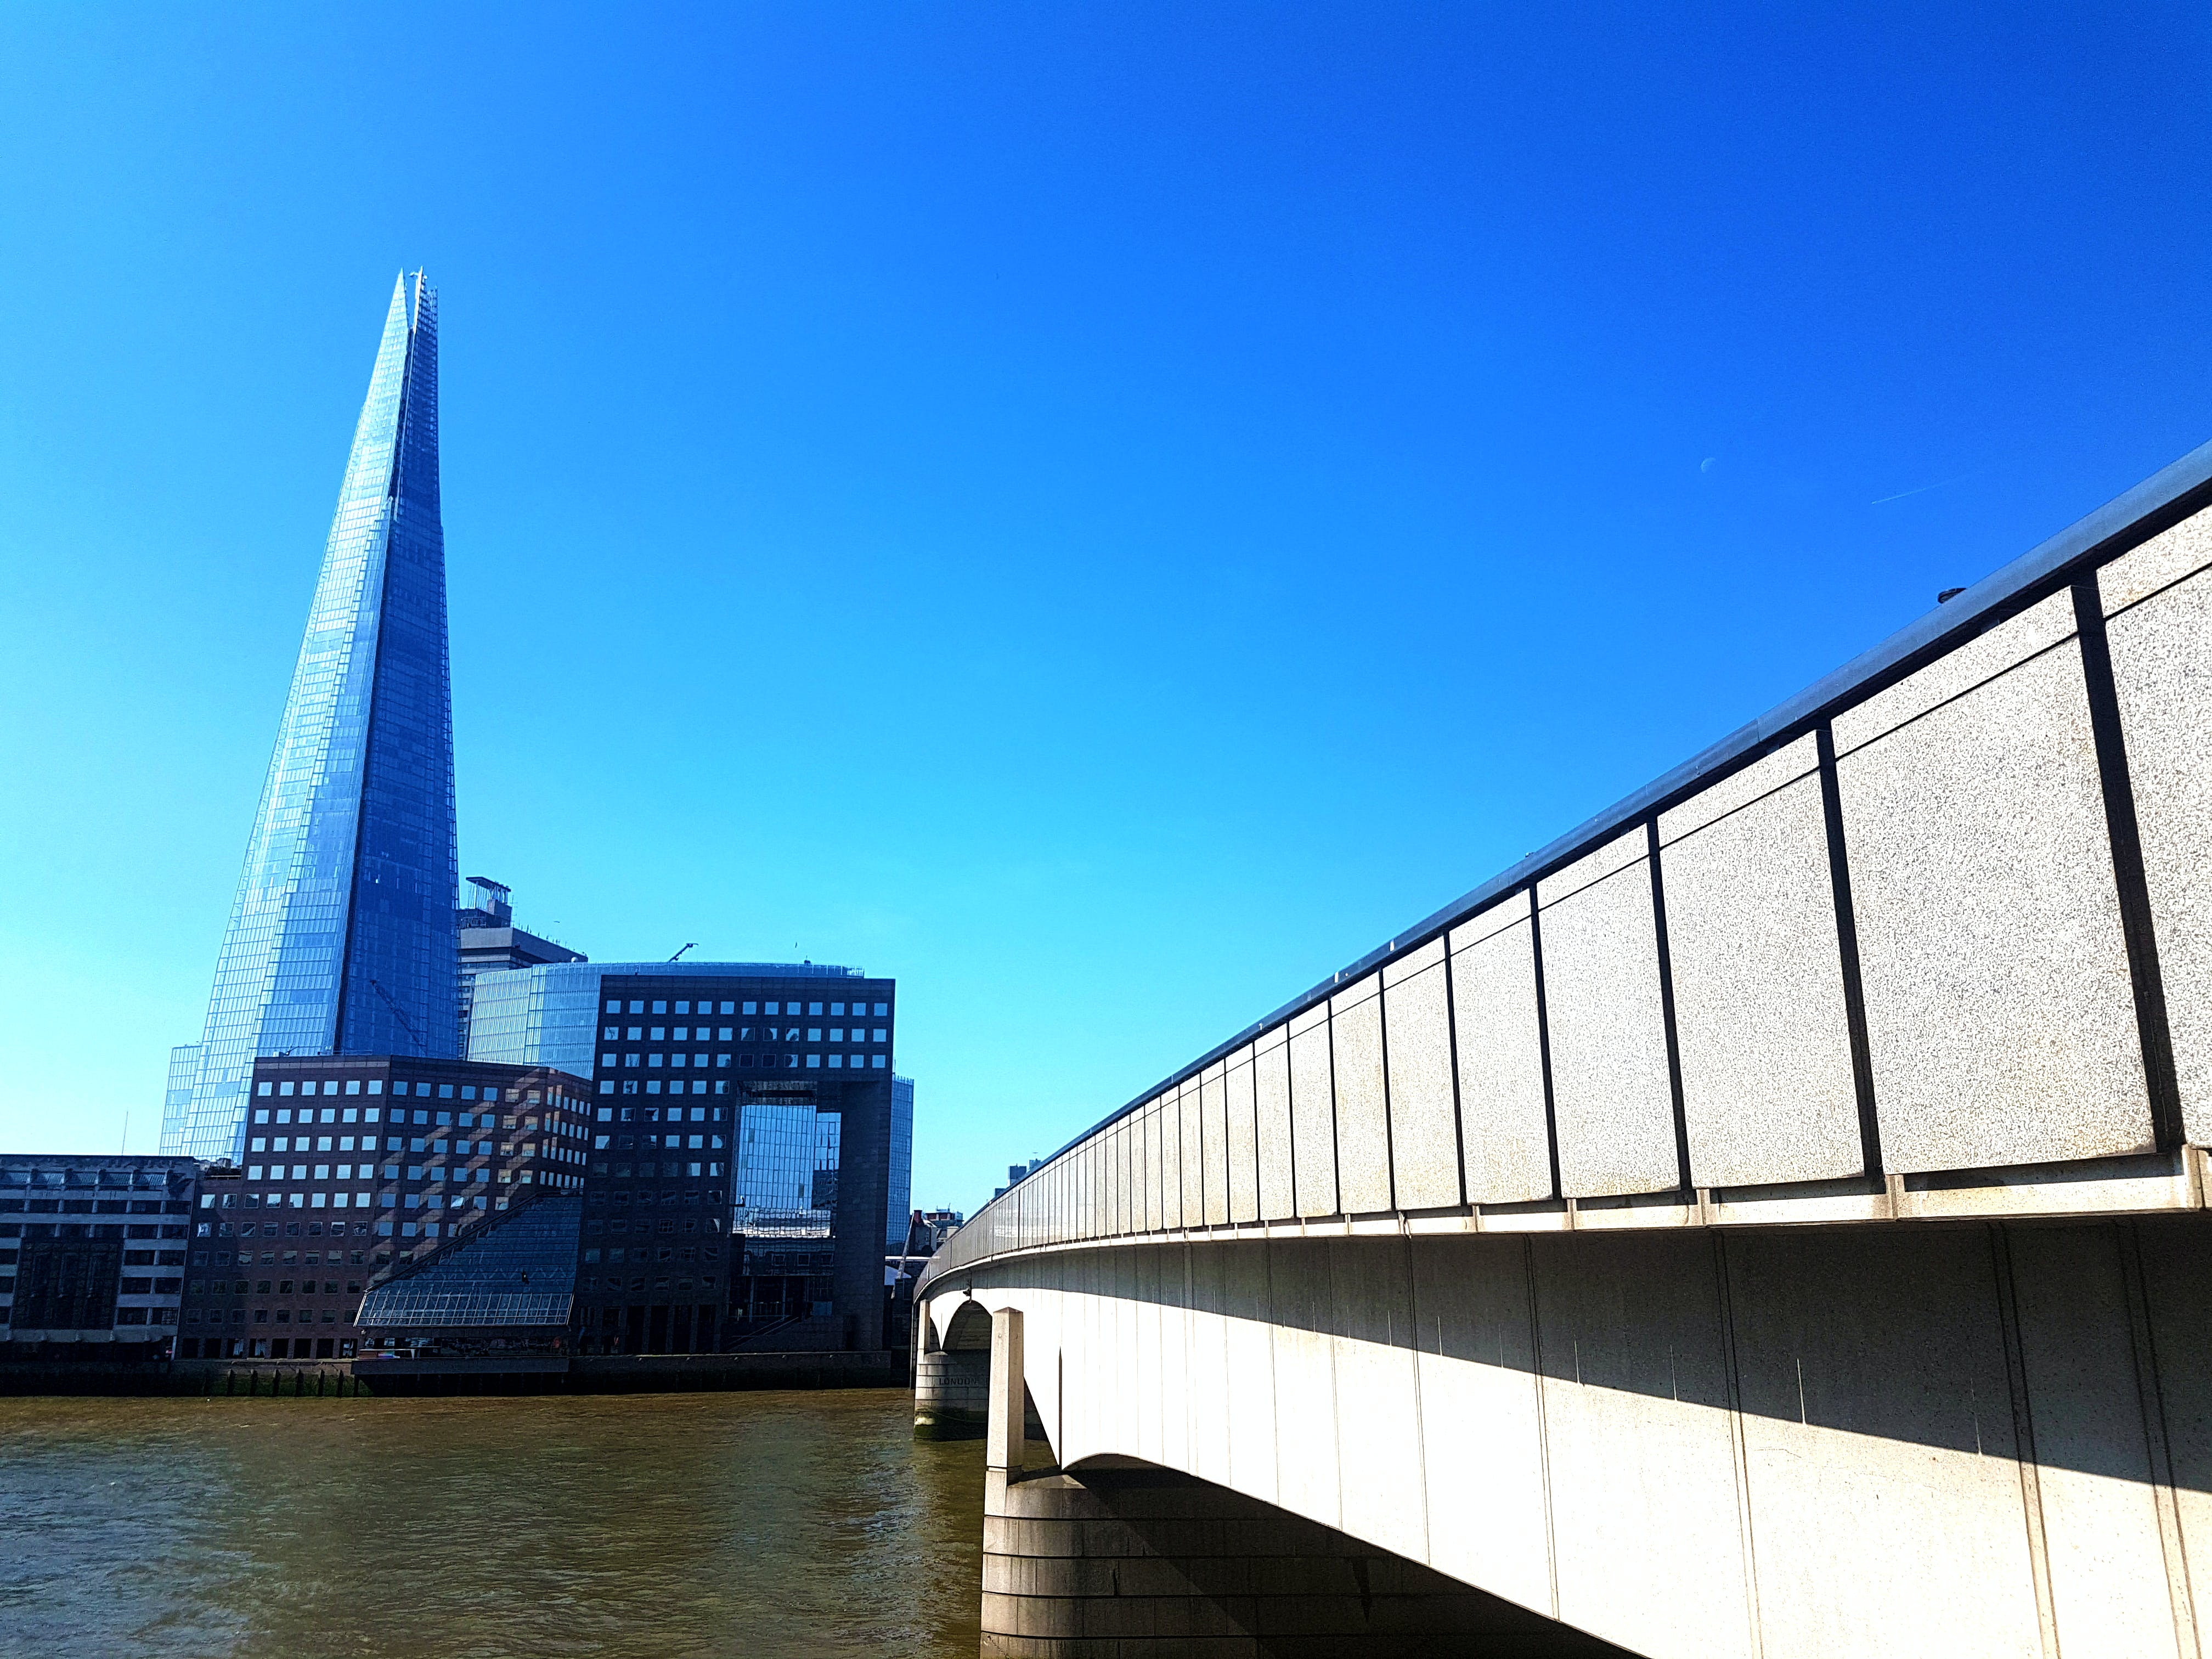 Free stock photo of bridge, london bridge, The Shard